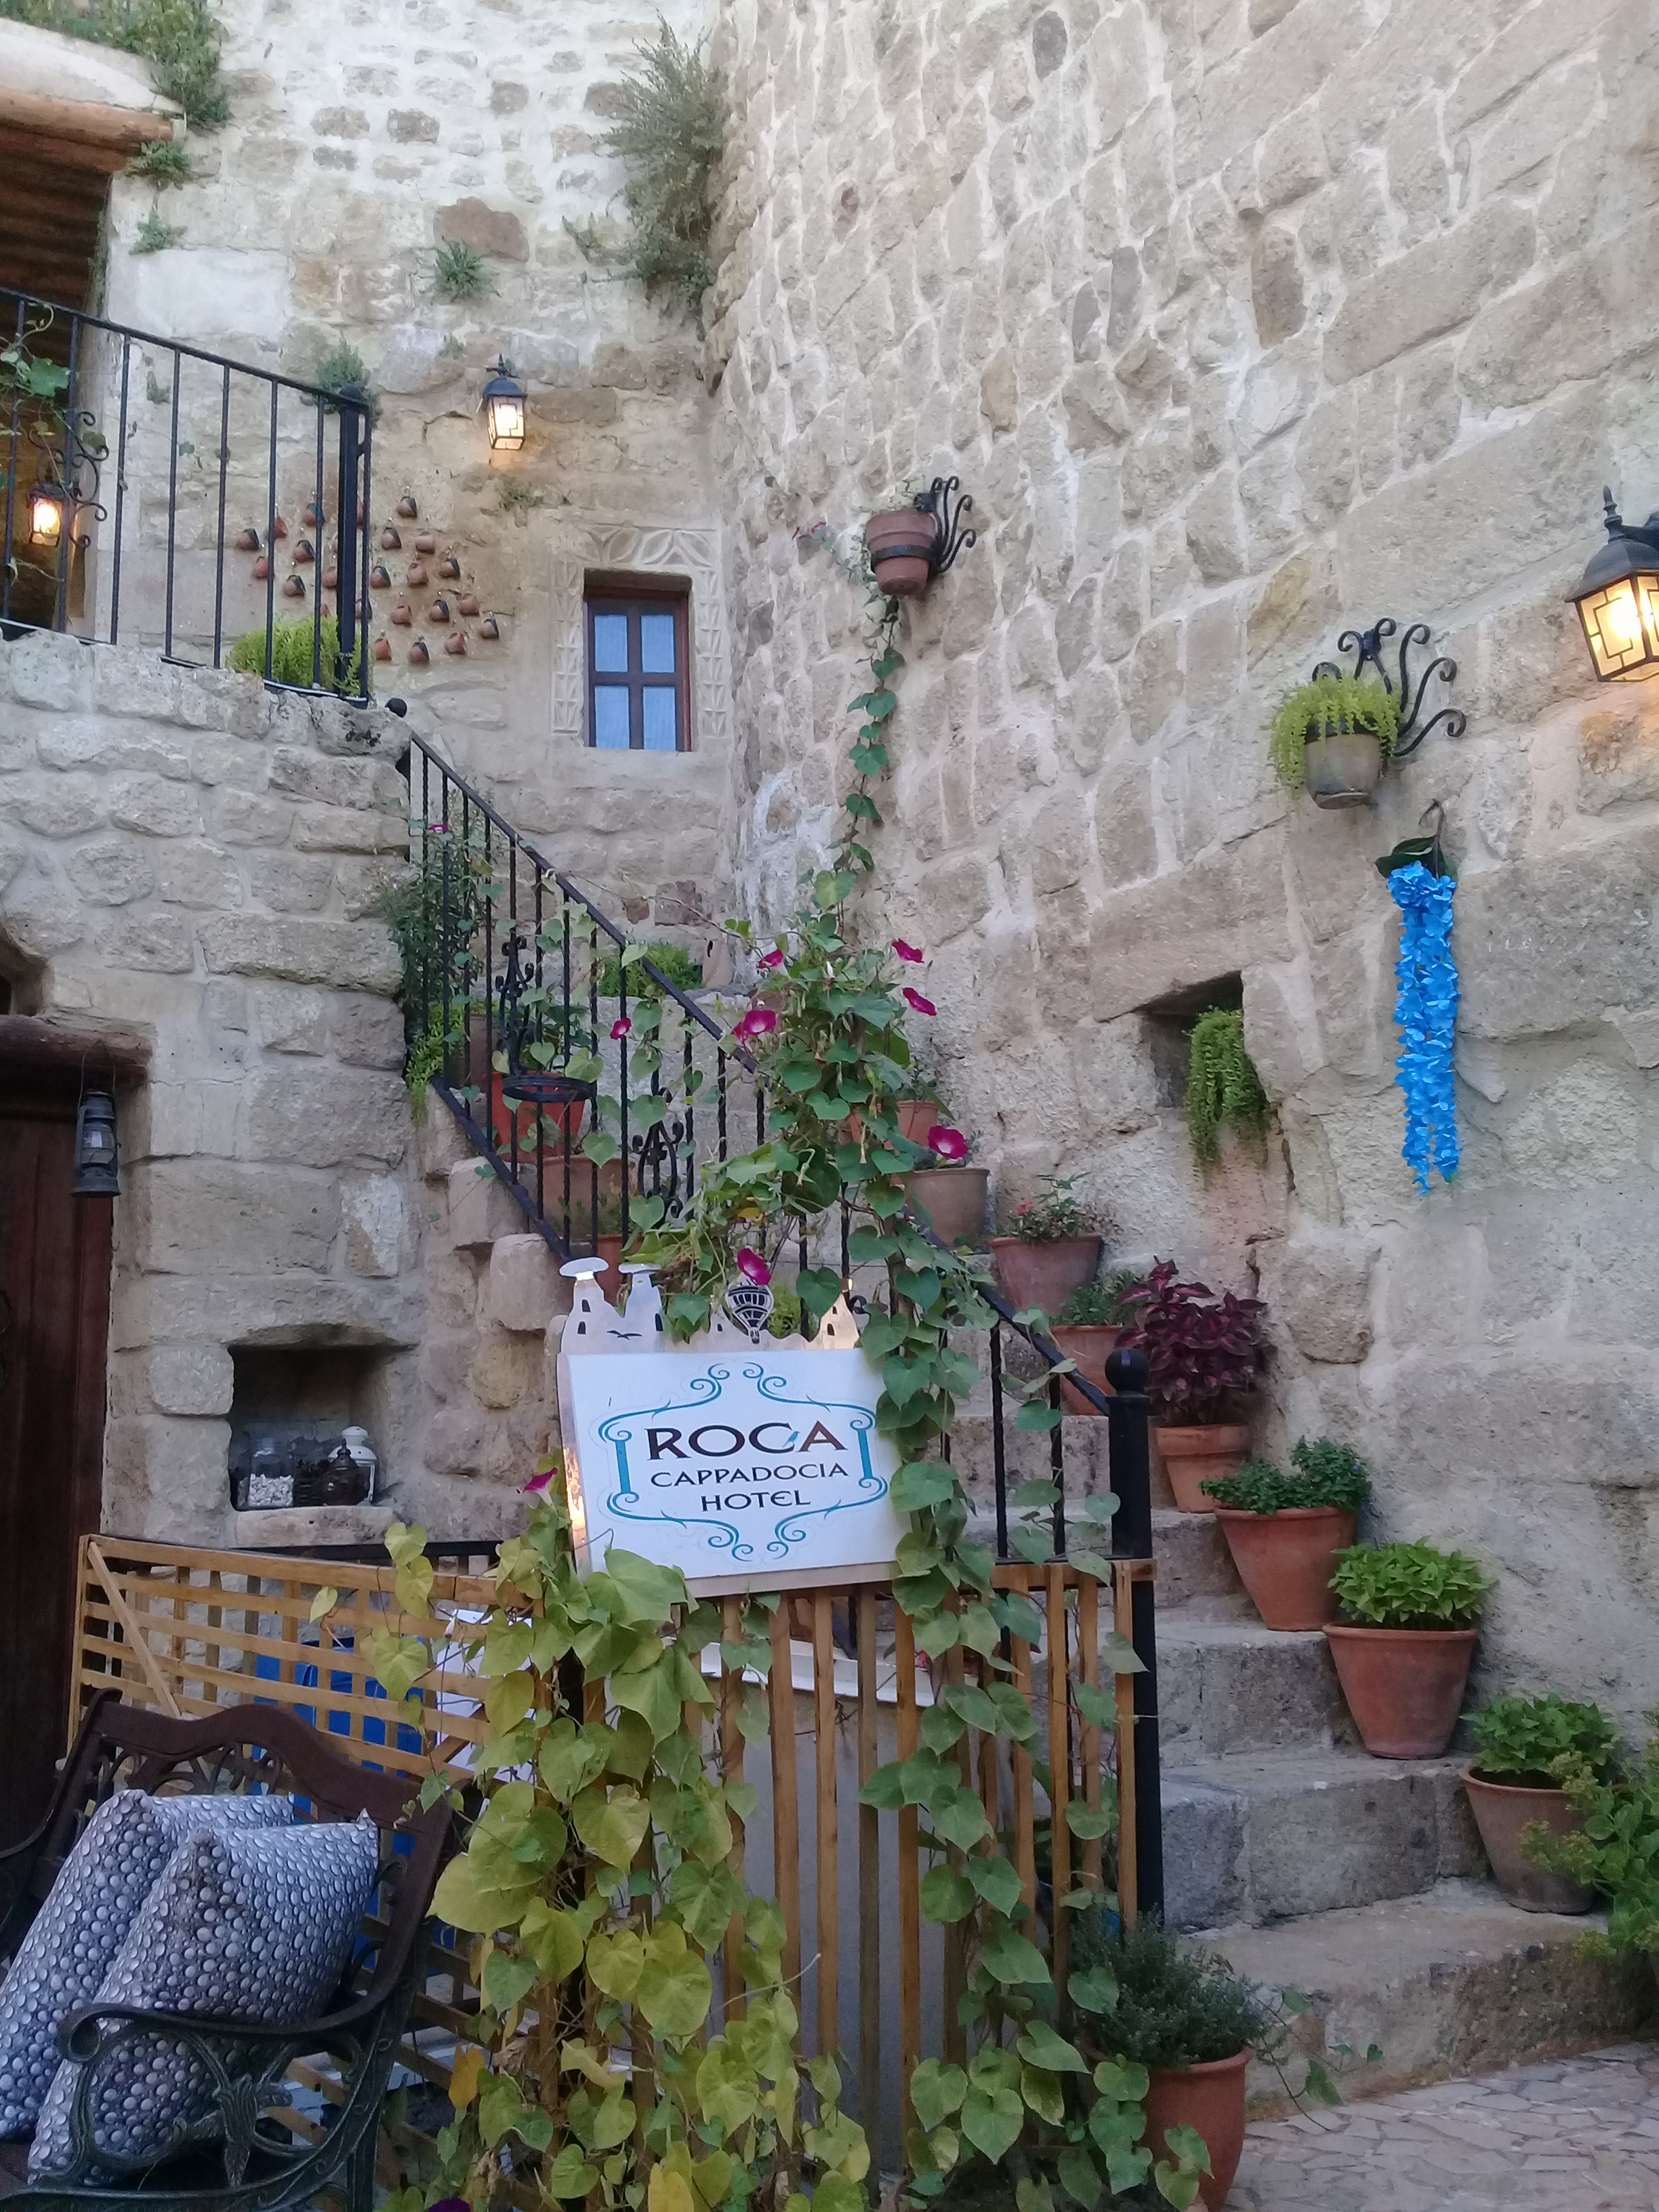 Roca Cappdocia Cave Hotel, Urgup